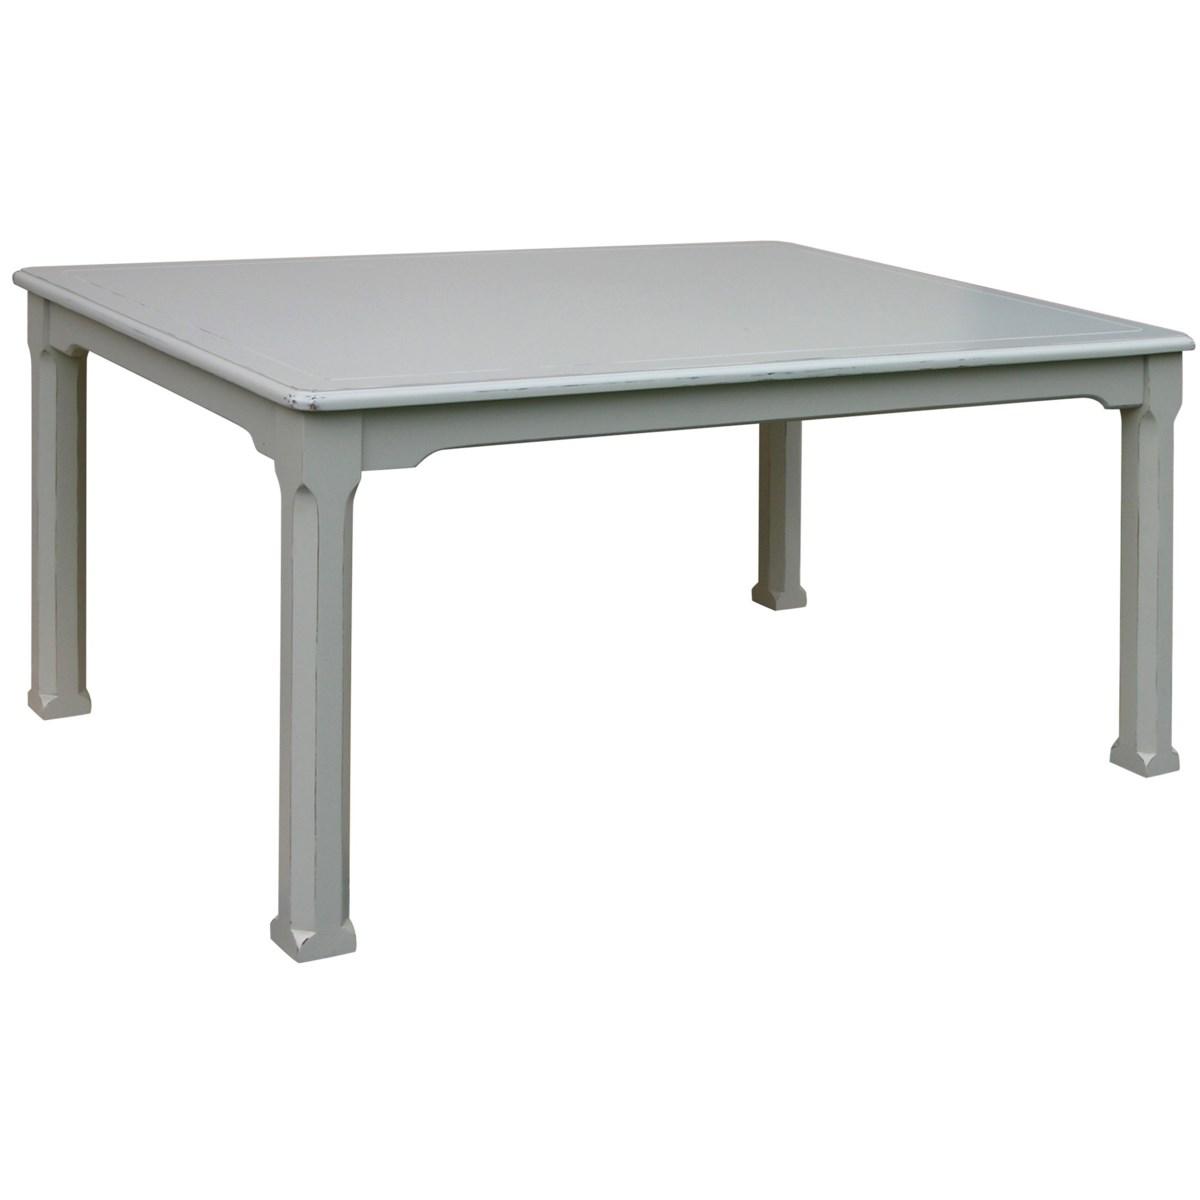 HARBORTON BREAKFAST TABLE -  WHT/RW+